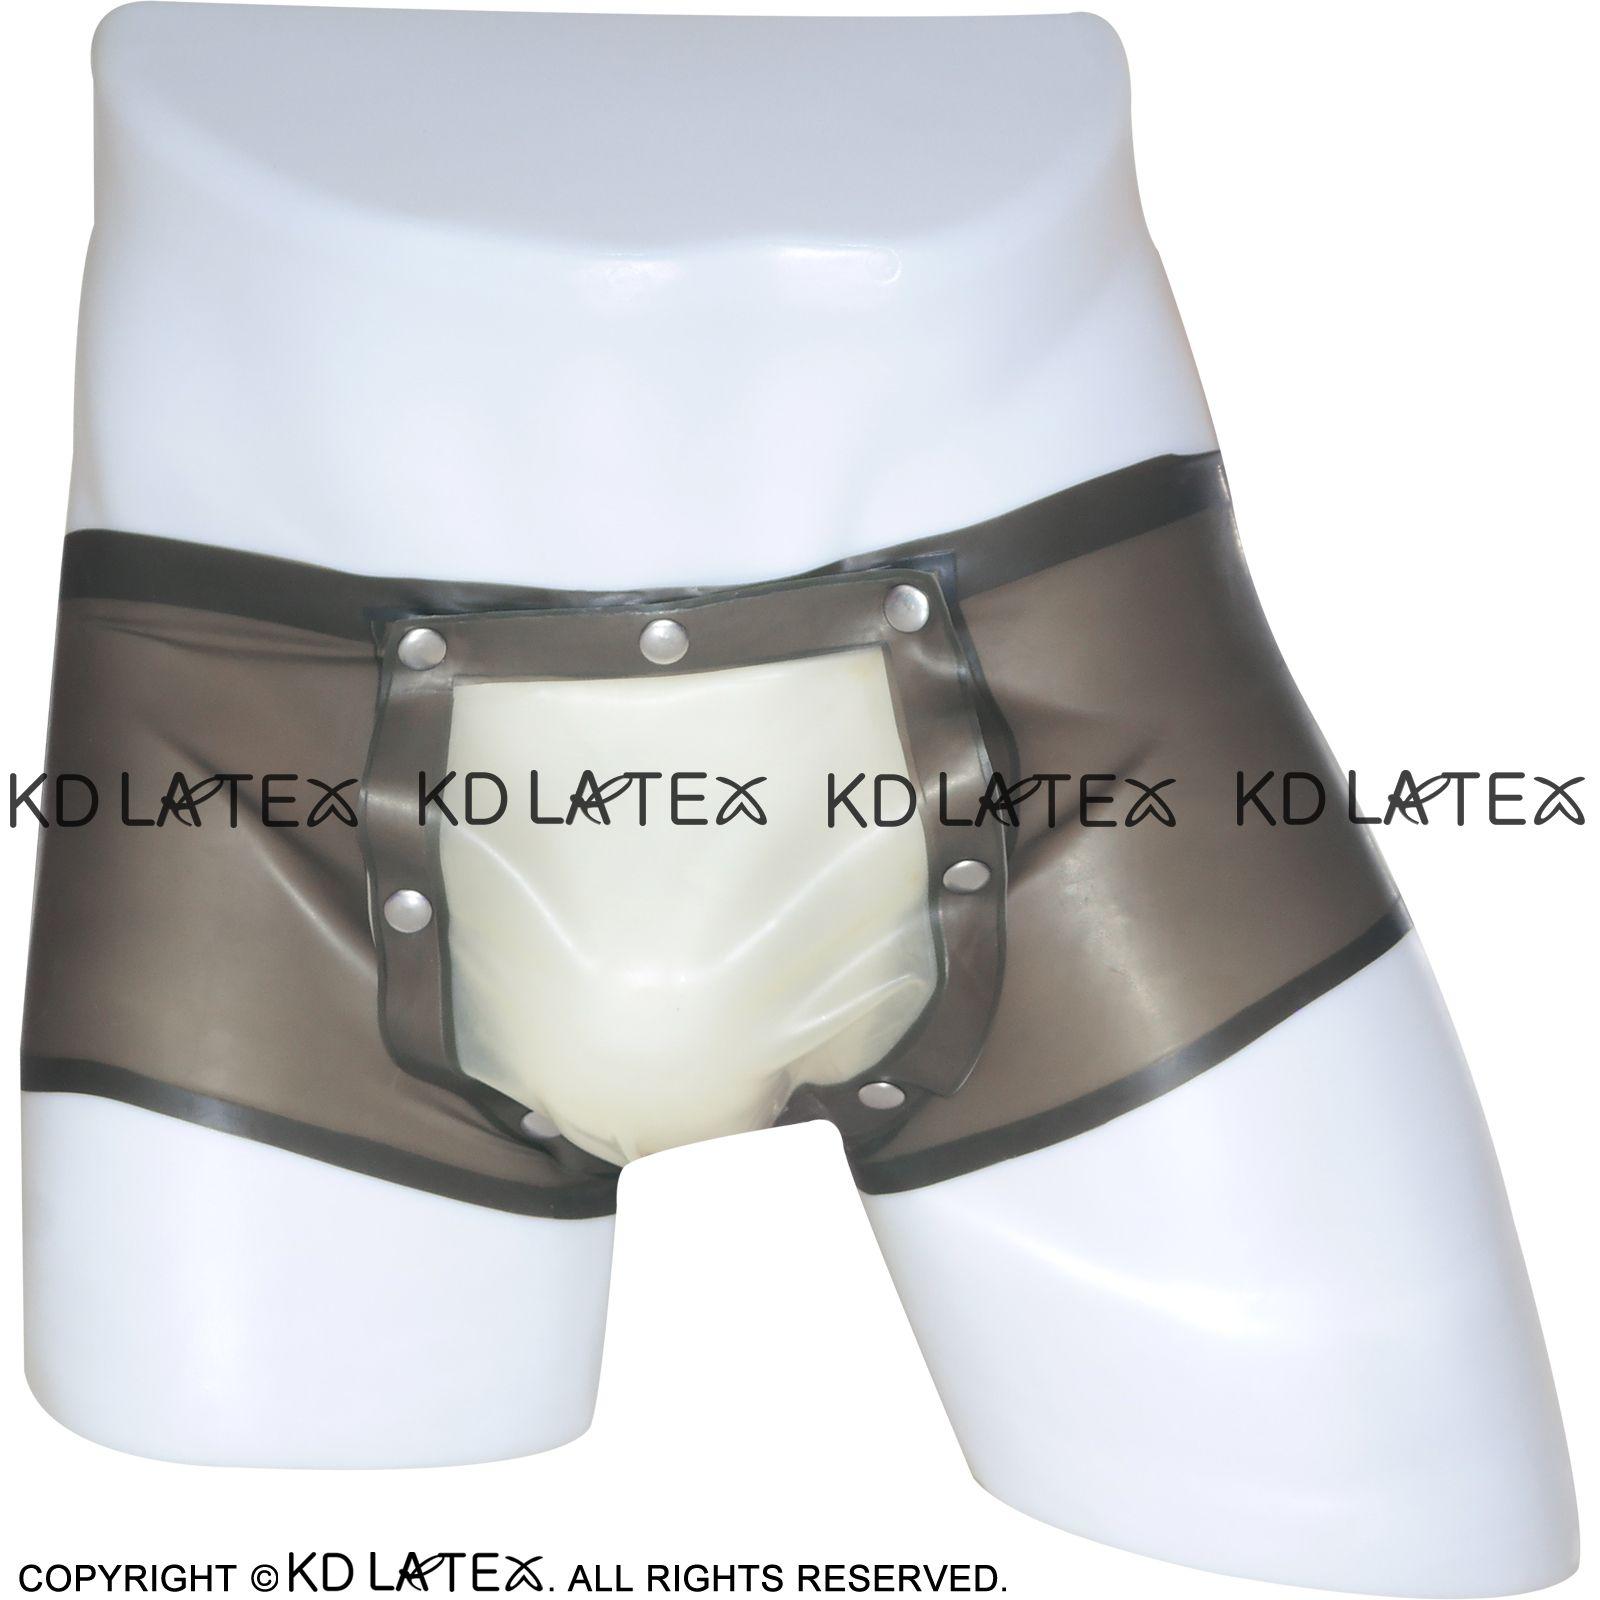 Seksi Lateks Boxer Şort ile Codpiece Açık Kasık Kauçuk Brifing Cod parça İç Bottoms Külot DK-0048